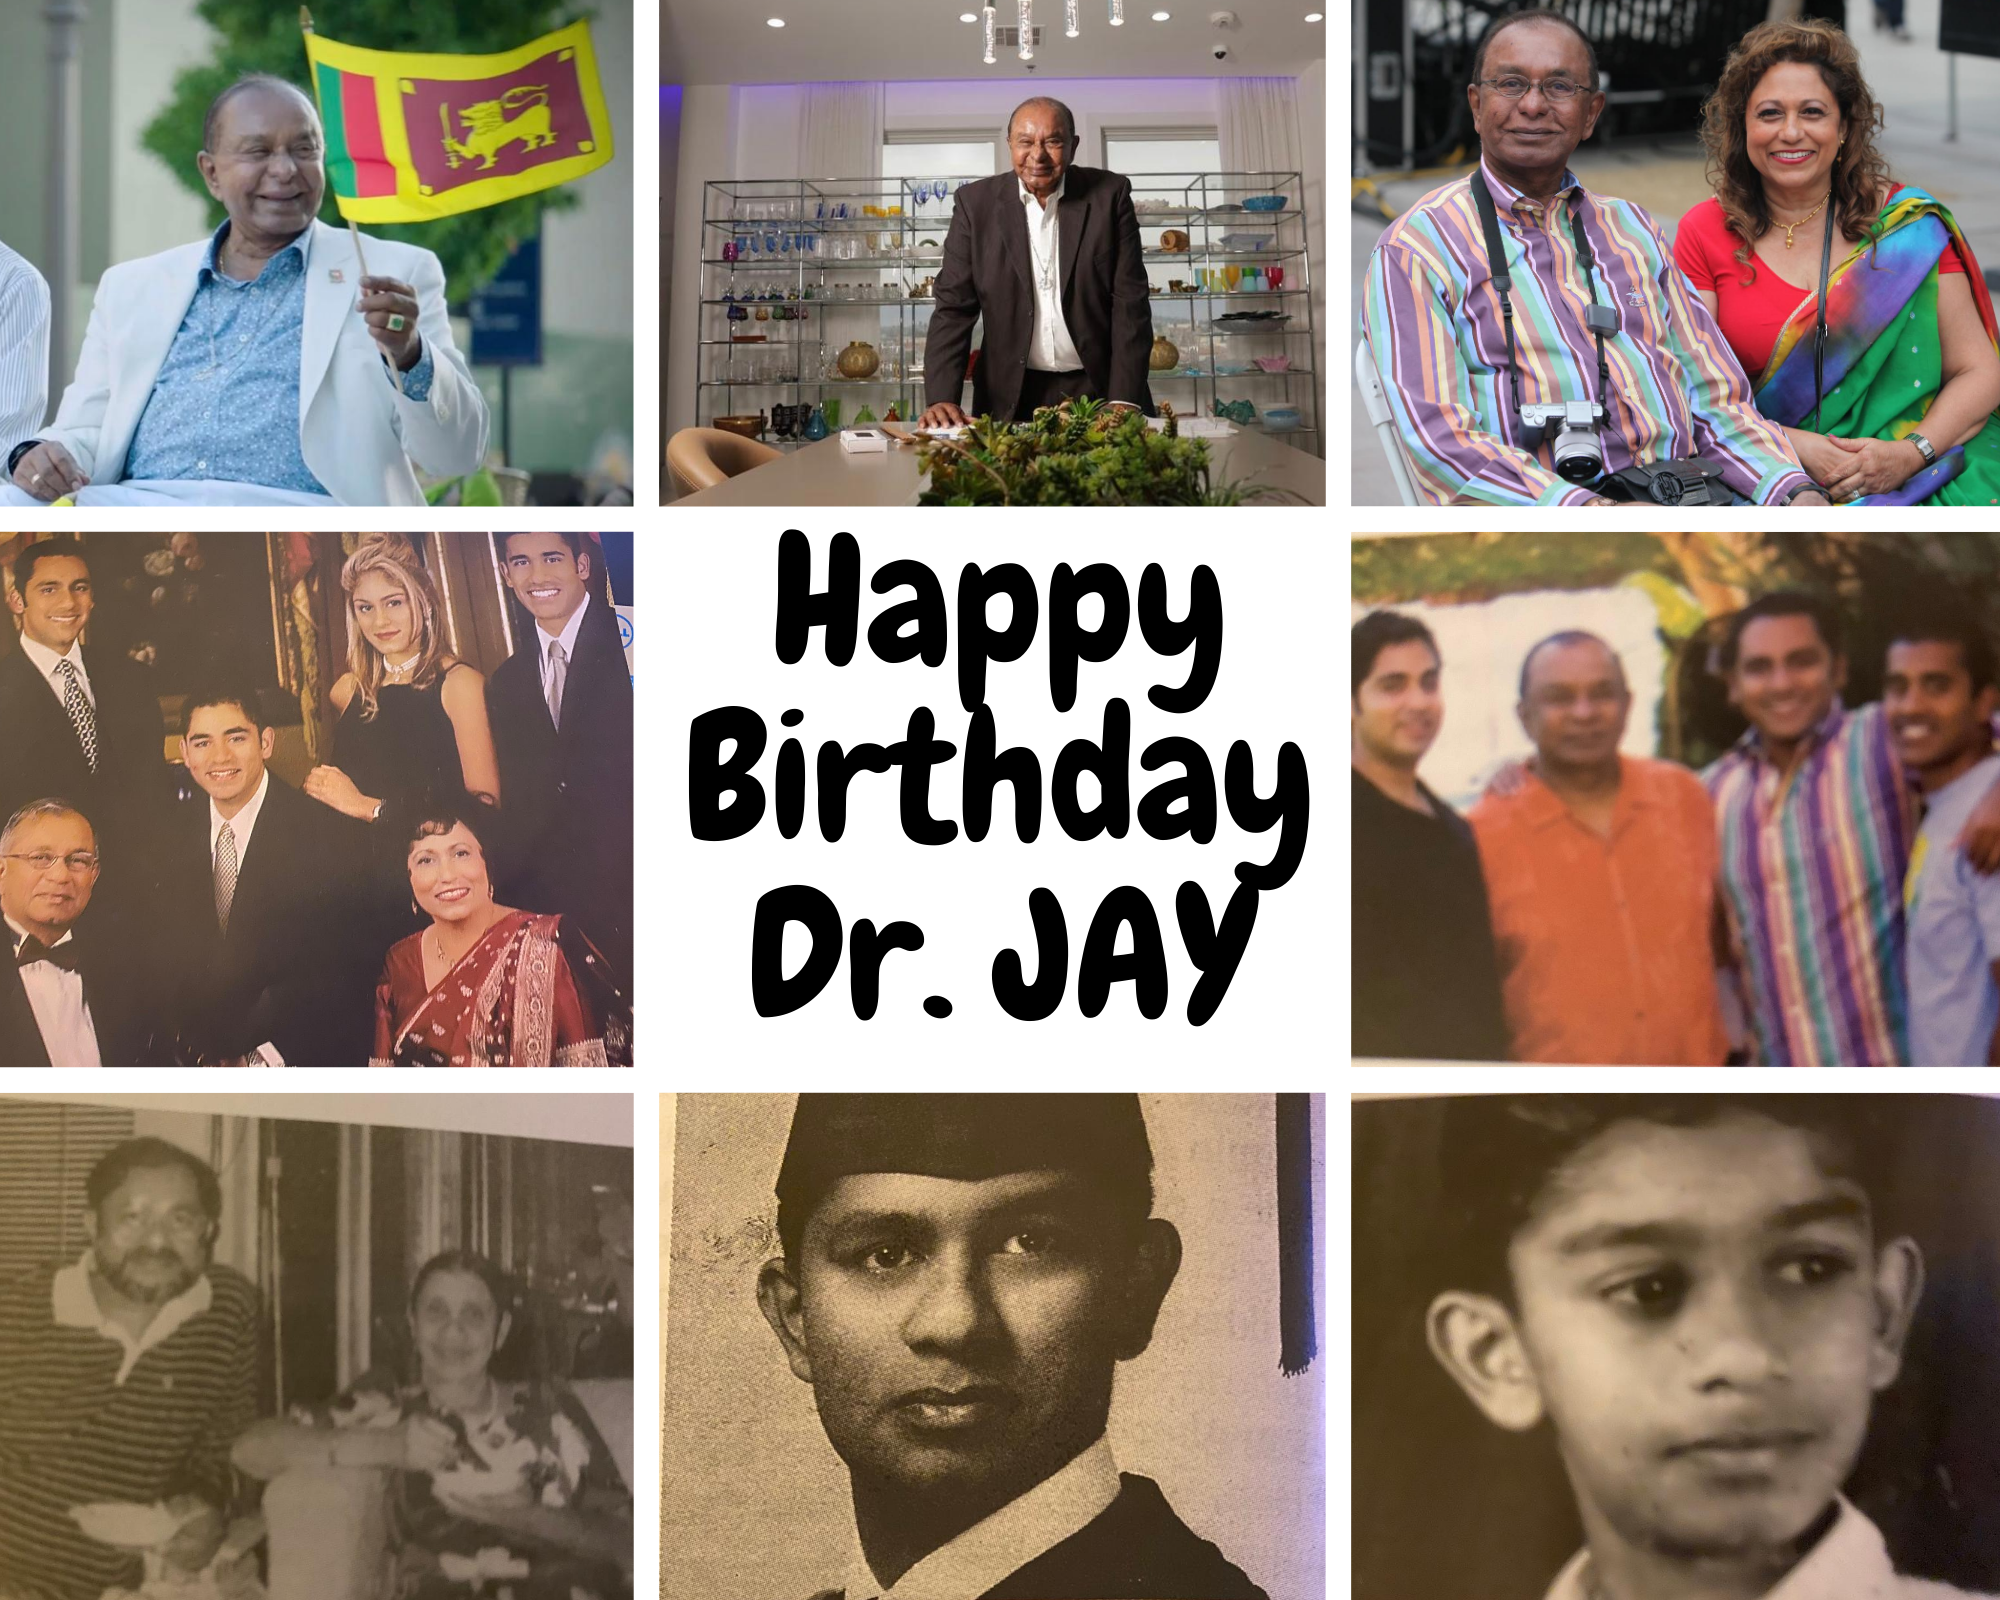 Dr. Jay Birthday 1